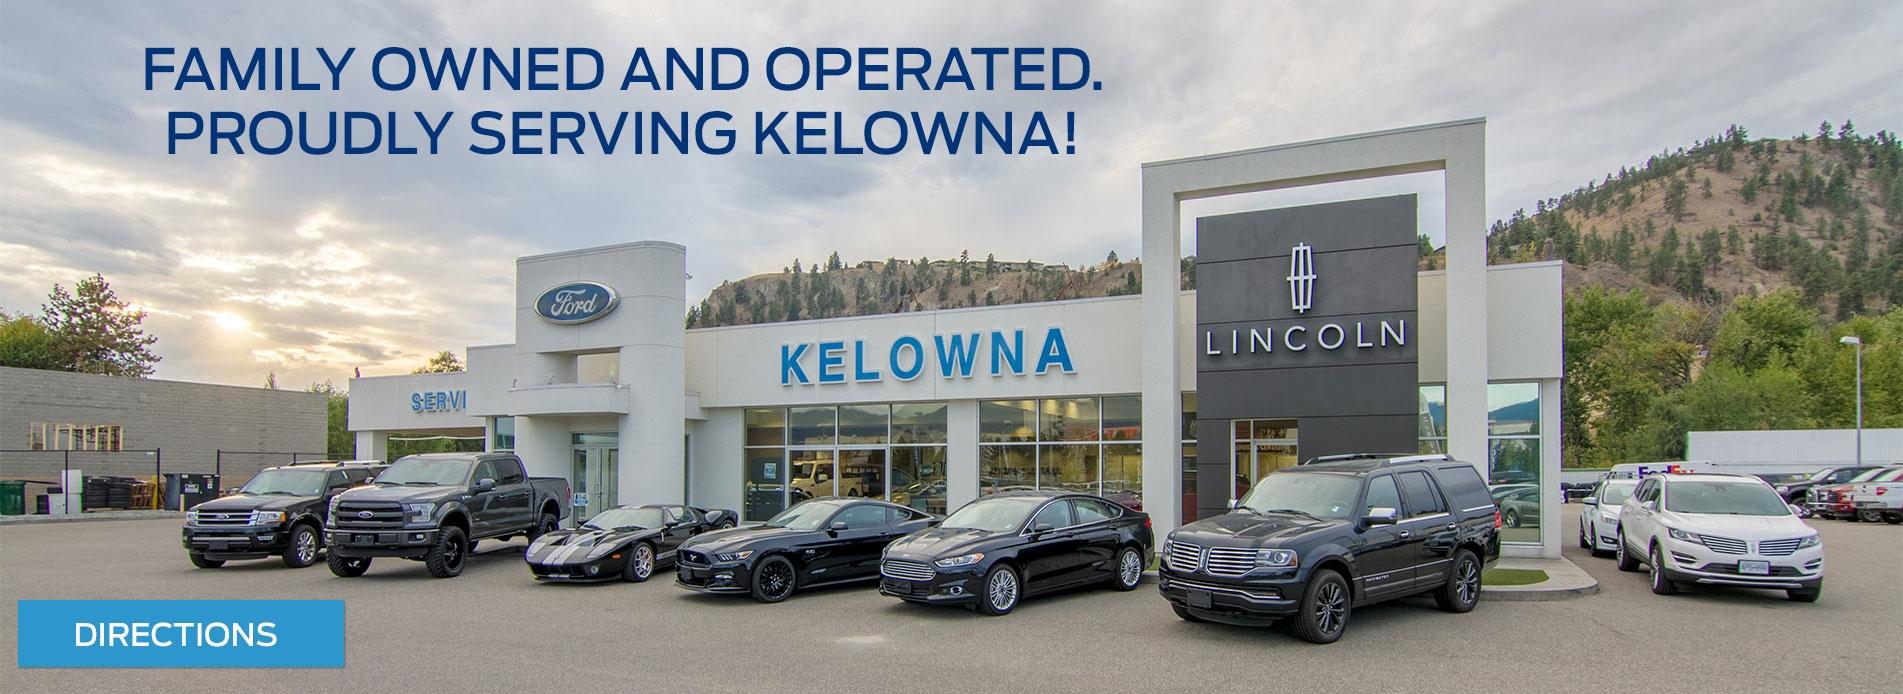 Kelowna Ford Lincoln Dealership Serving Kelowna Bc Ford